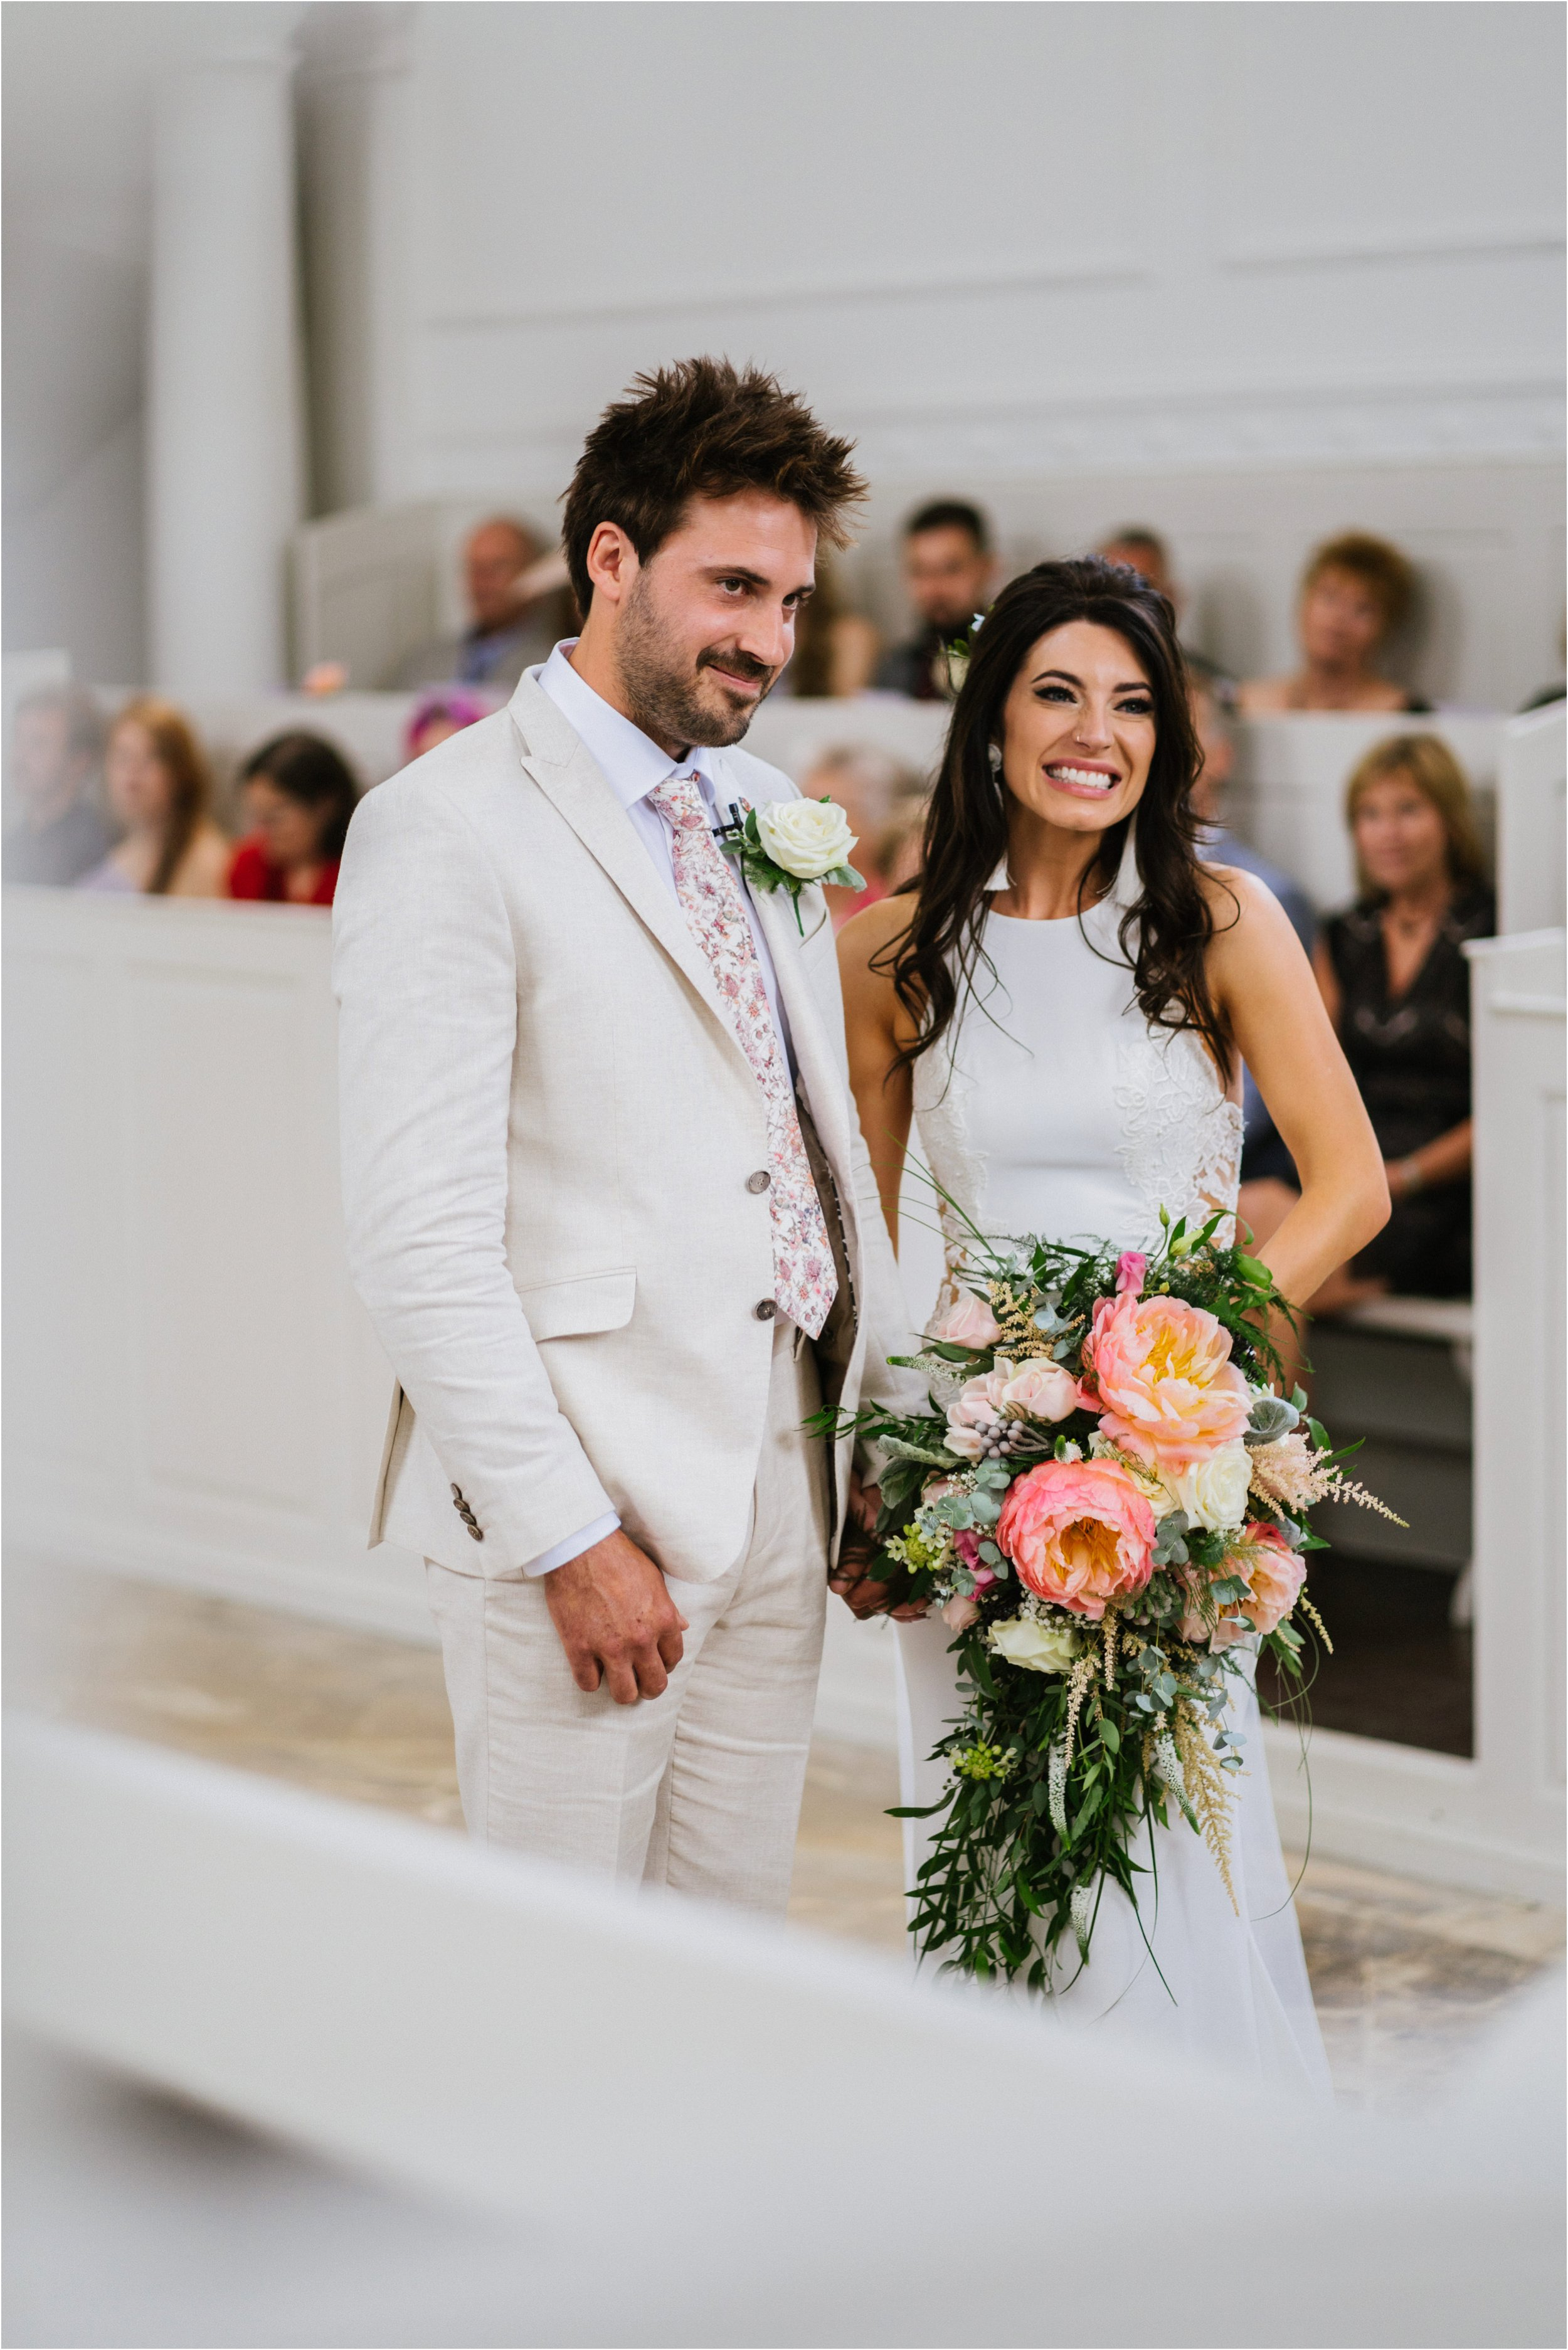 Compton Verney wedding photography_0059.jpg